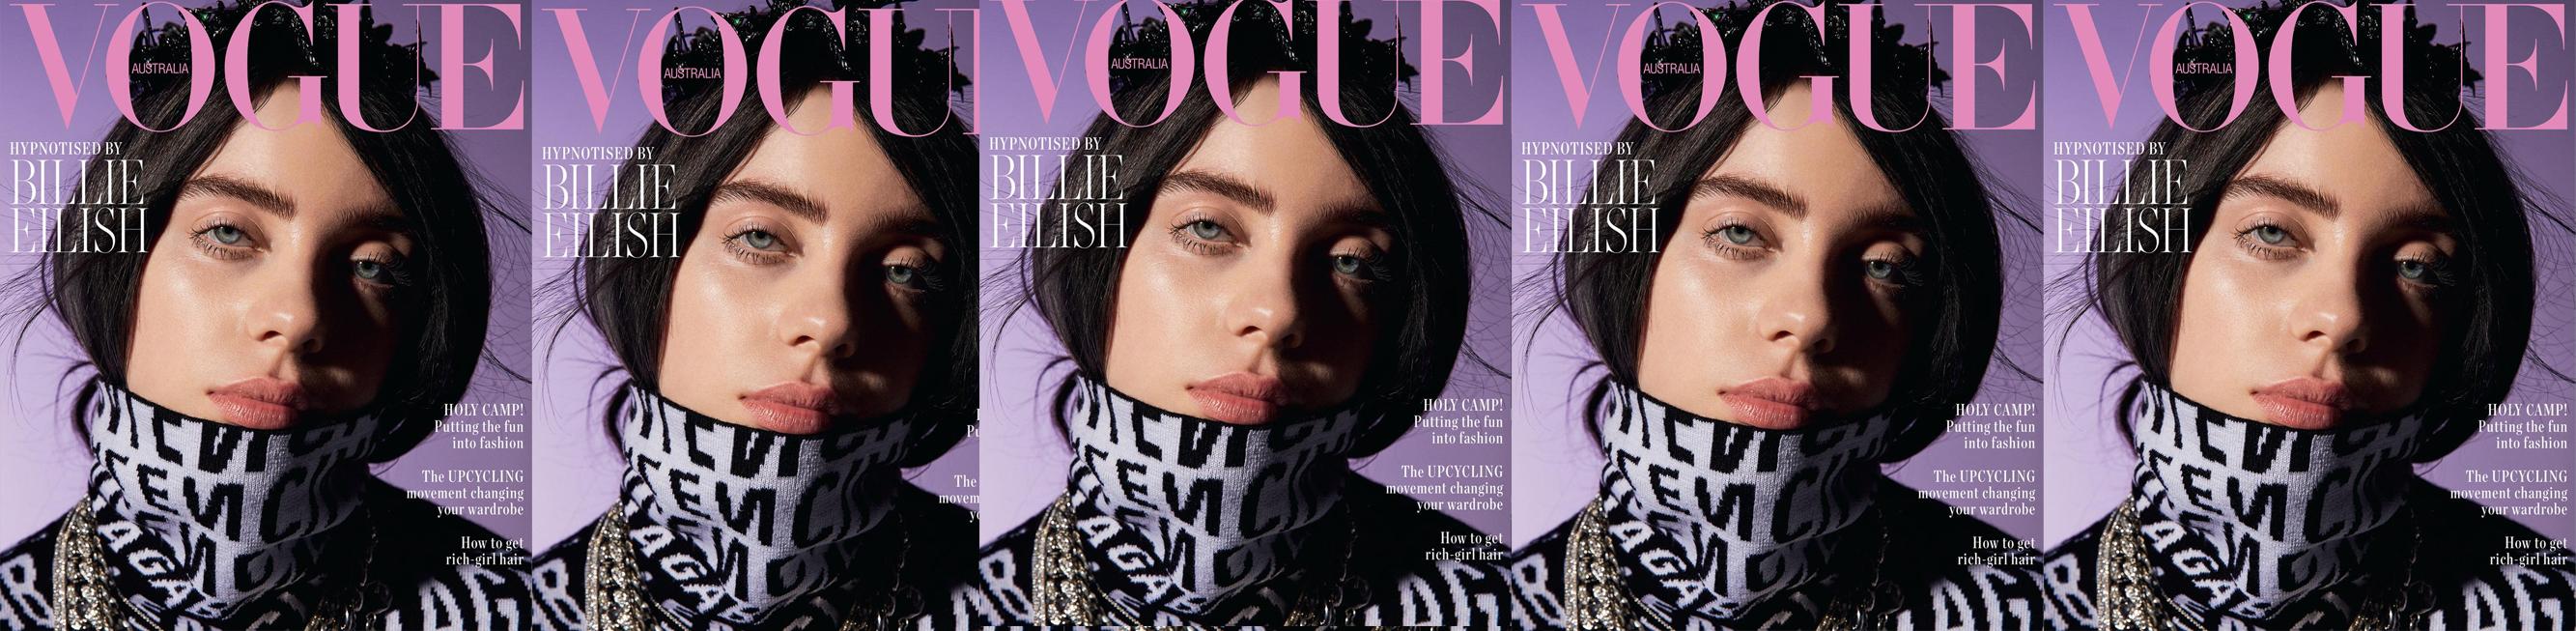 Vogue Australia - Billie Eillish in J Farren-Price Diamonds article hero image